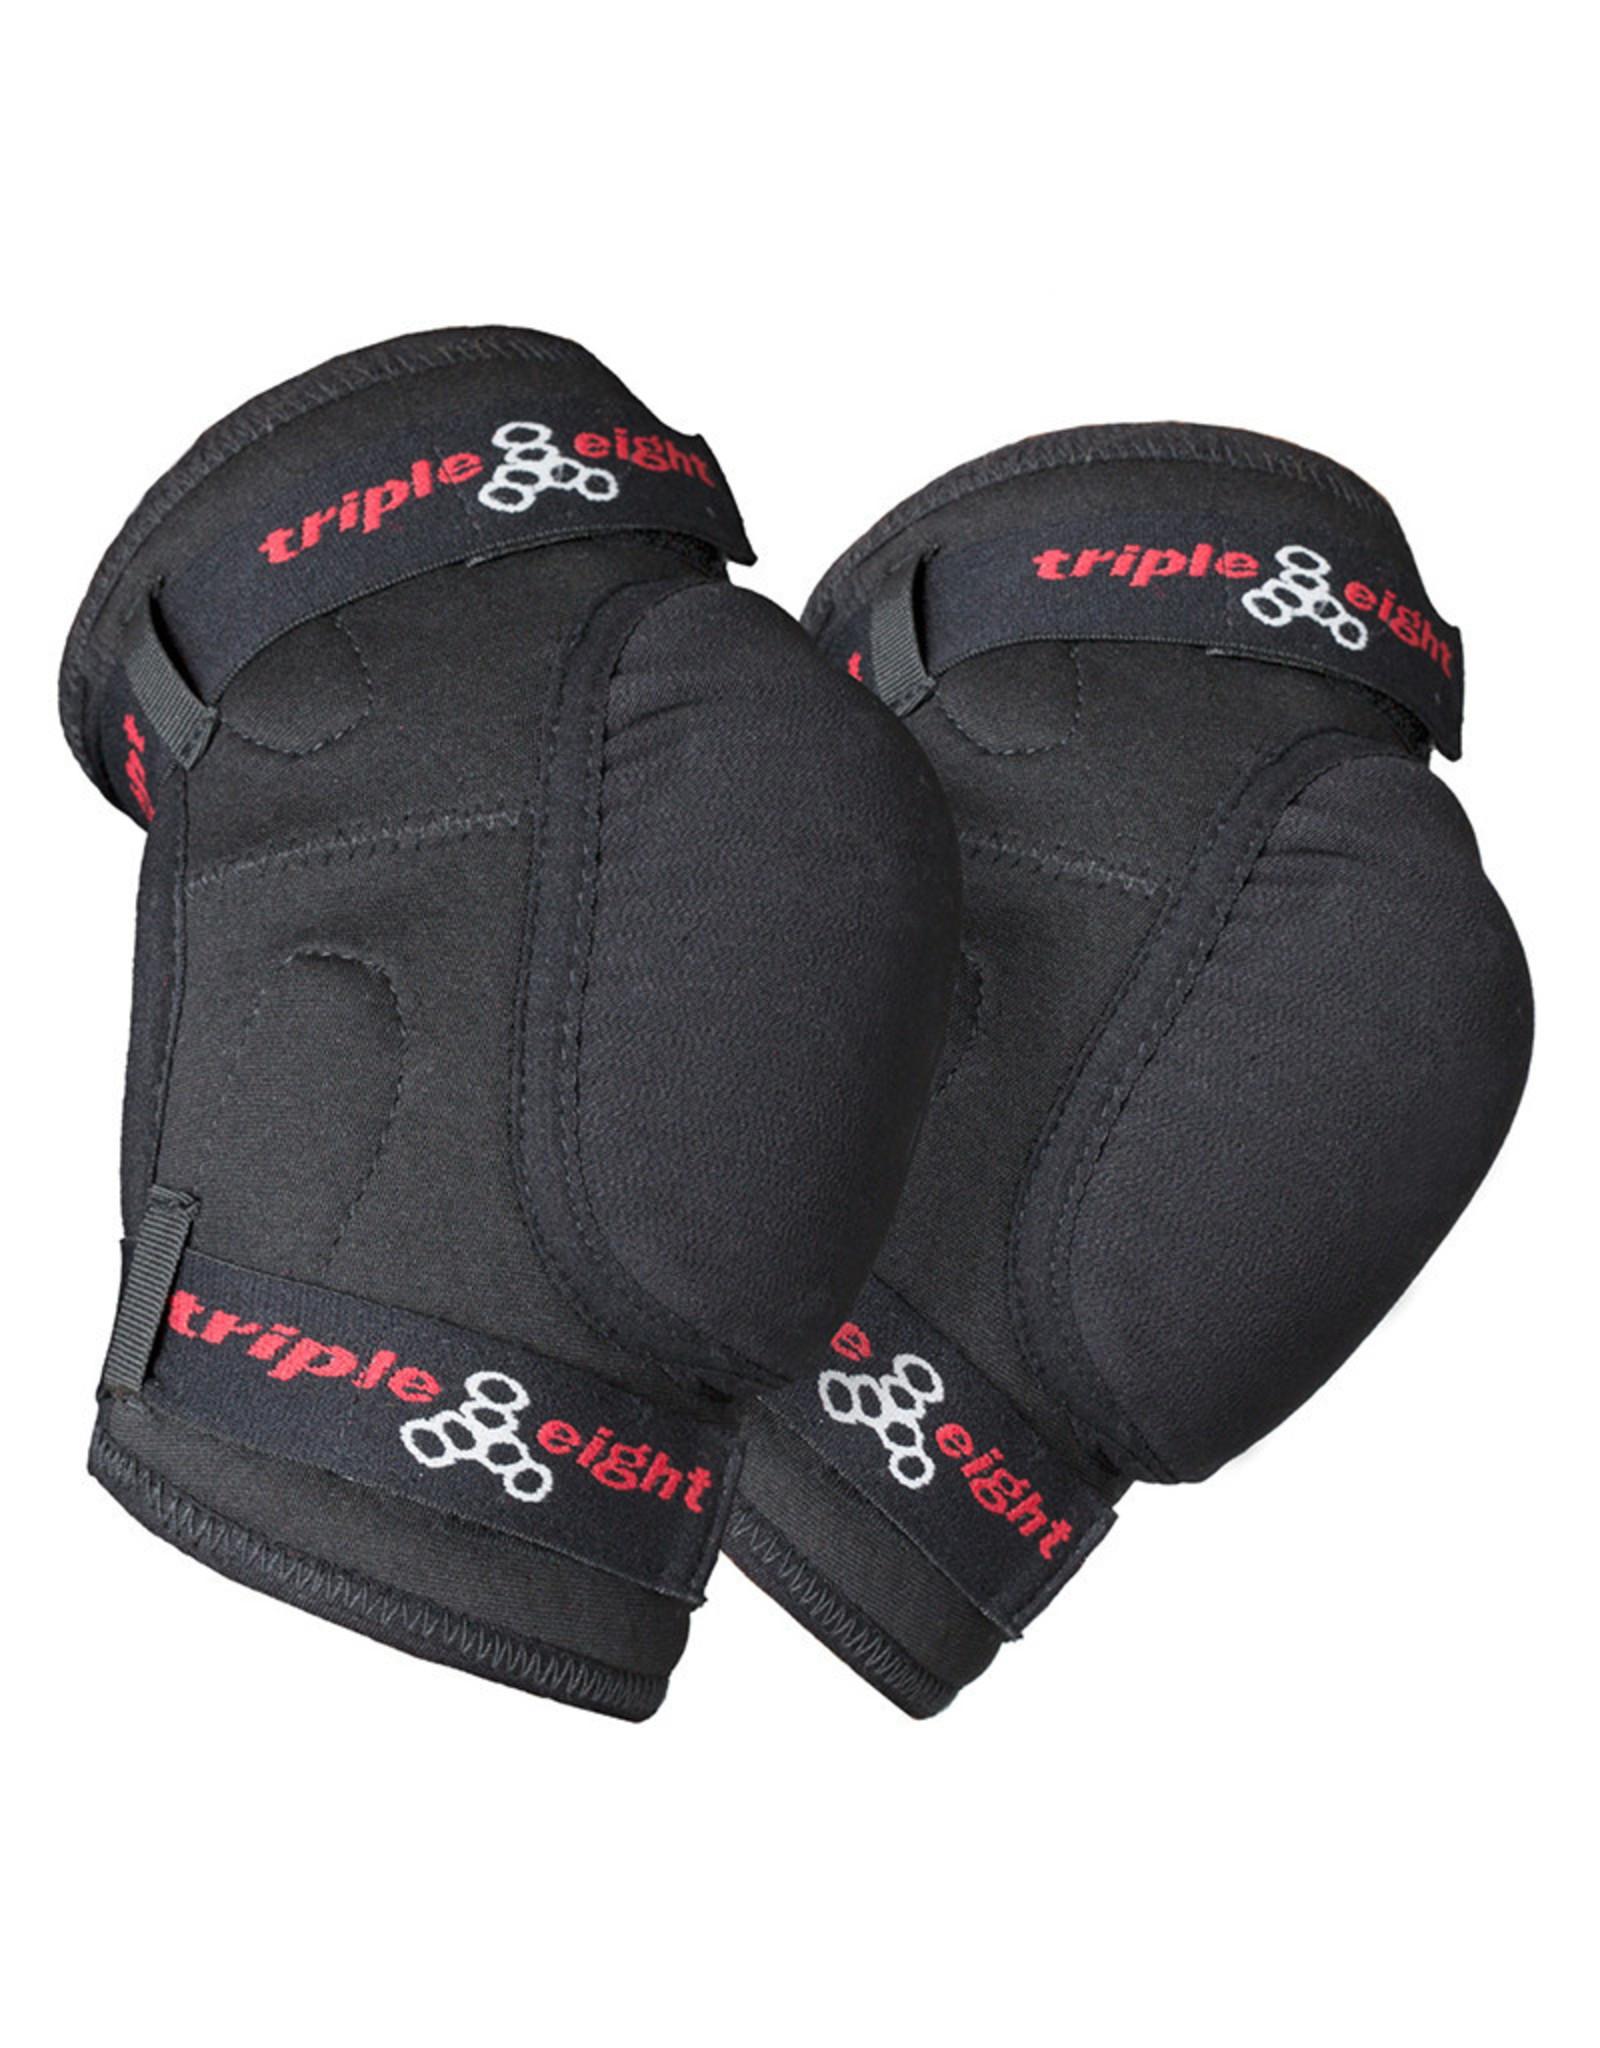 Triple 8 T8 Stealth Hardcap Elbow